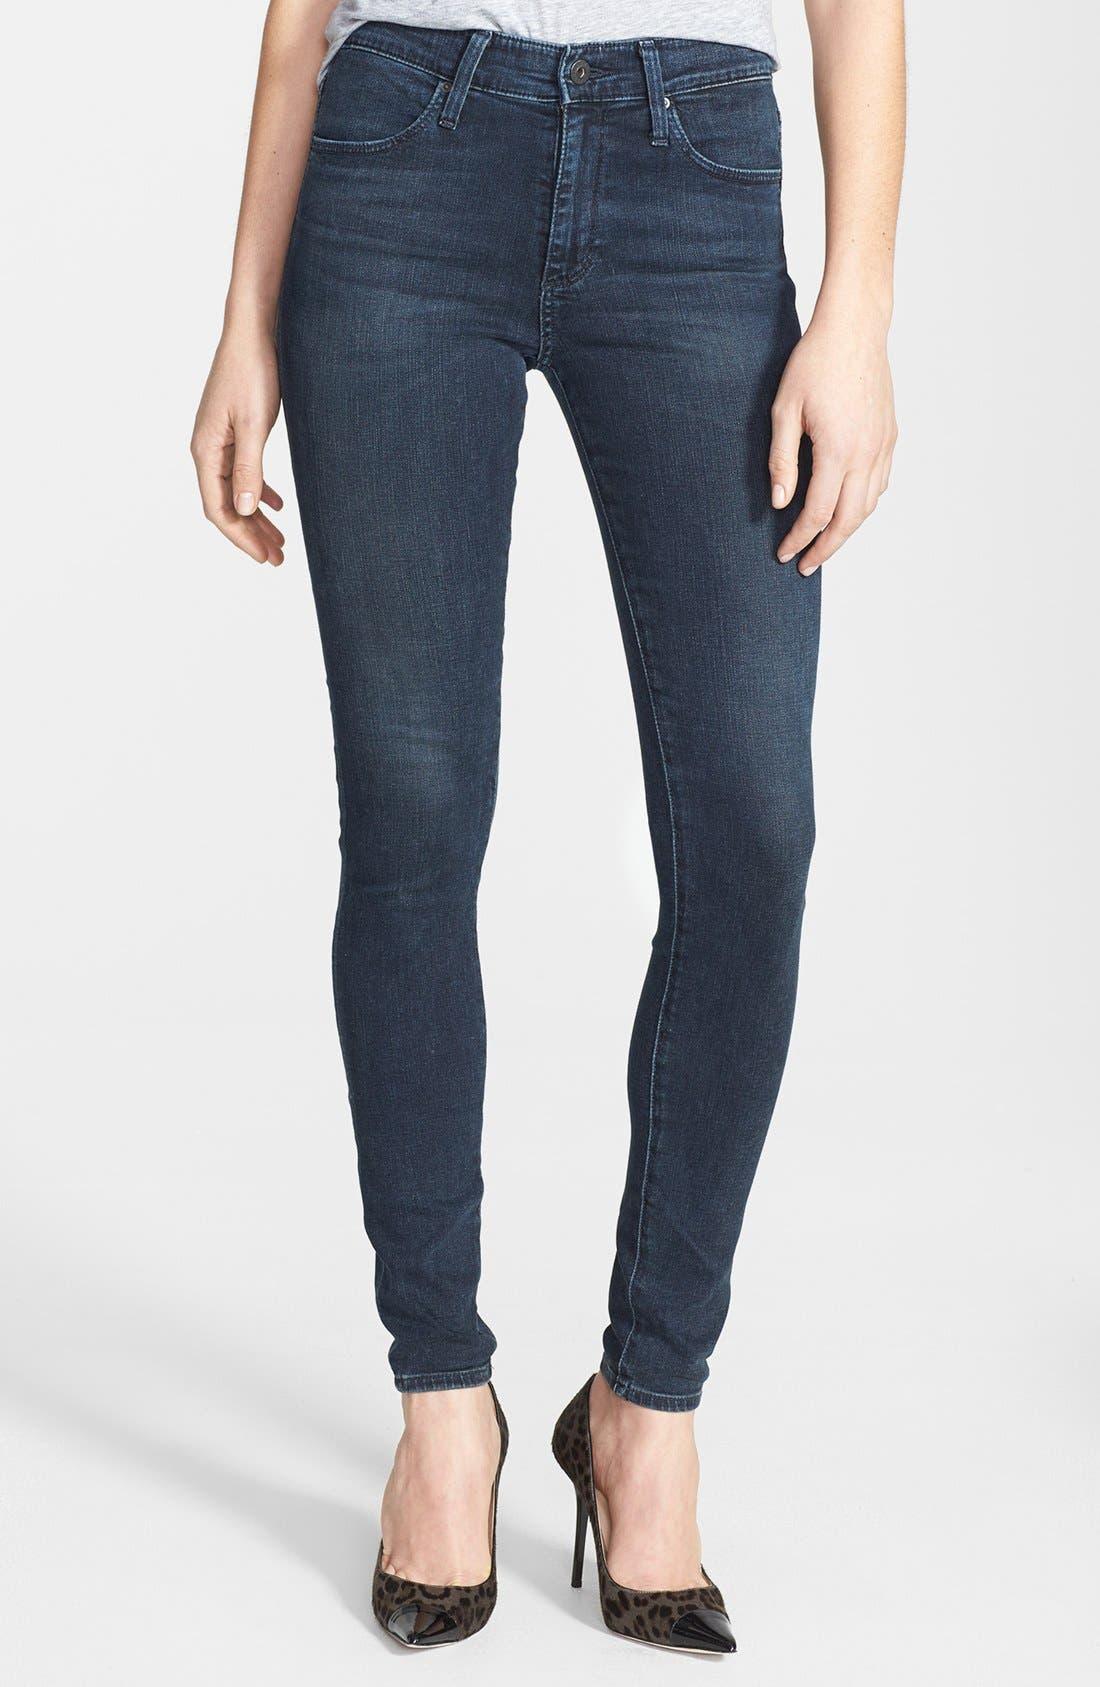 'The Farrah' High Rise Skinny Jeans,                             Main thumbnail 11, color,